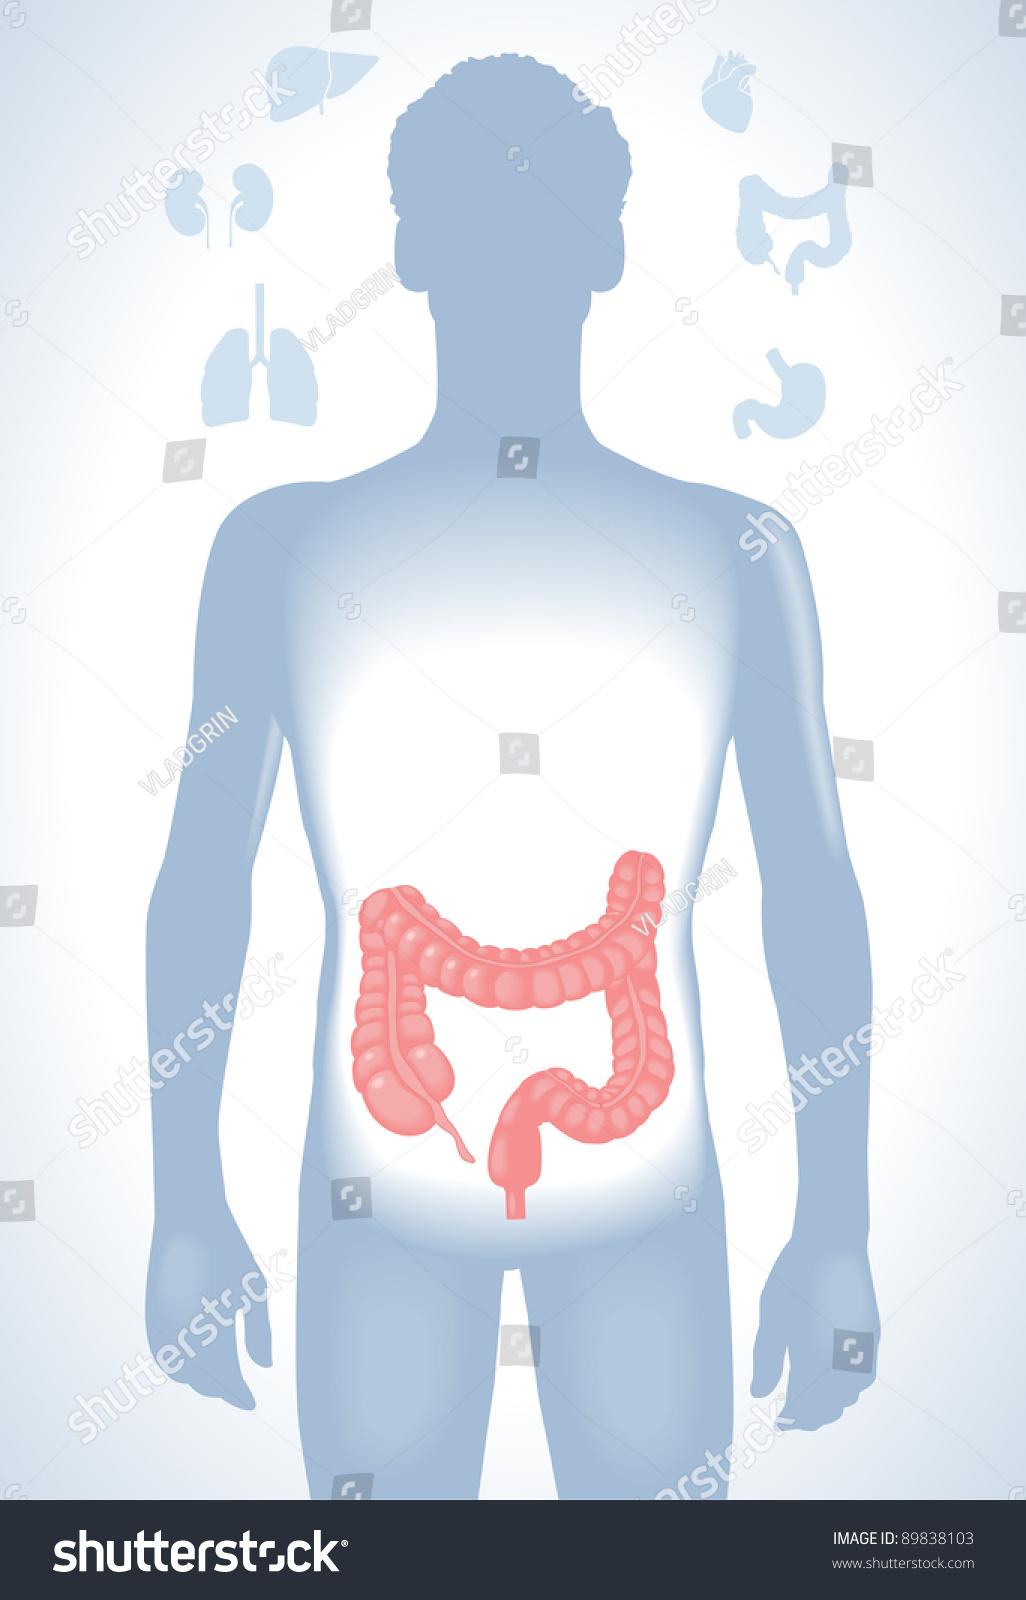 Set Human Anatomy Parts Liver Heart Stock Vector HD (Royalty Free ...